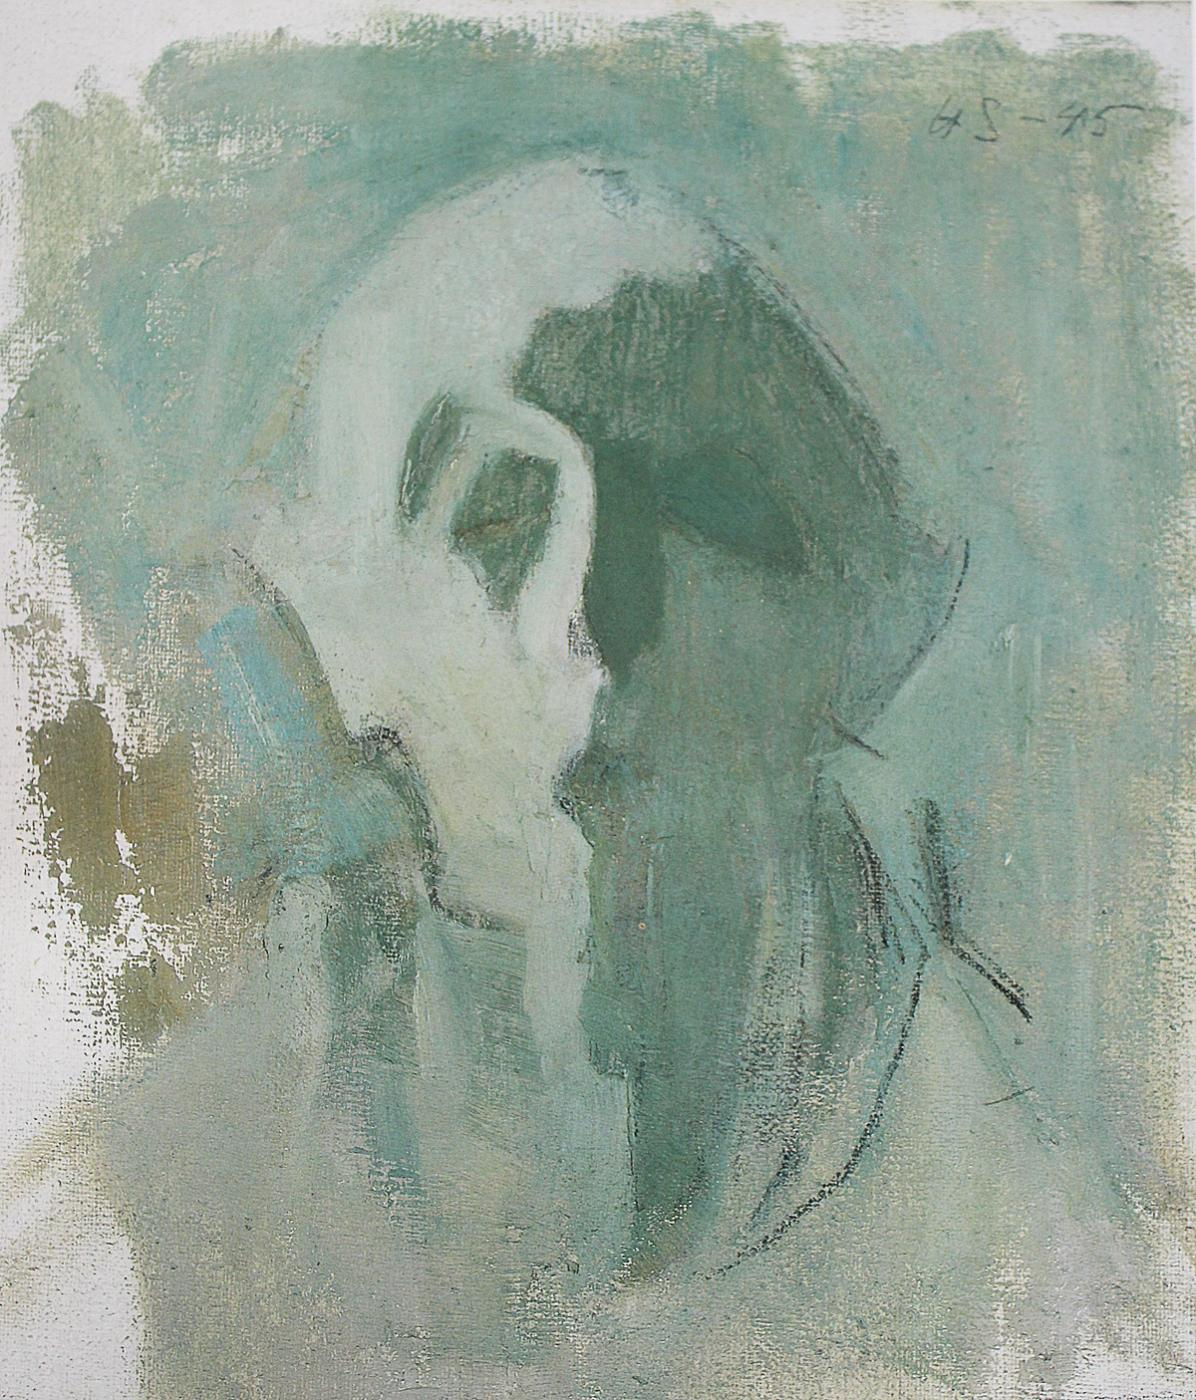 helene_schjerfbeck_green_self_portrait_light_and_shadows_1945.jpg